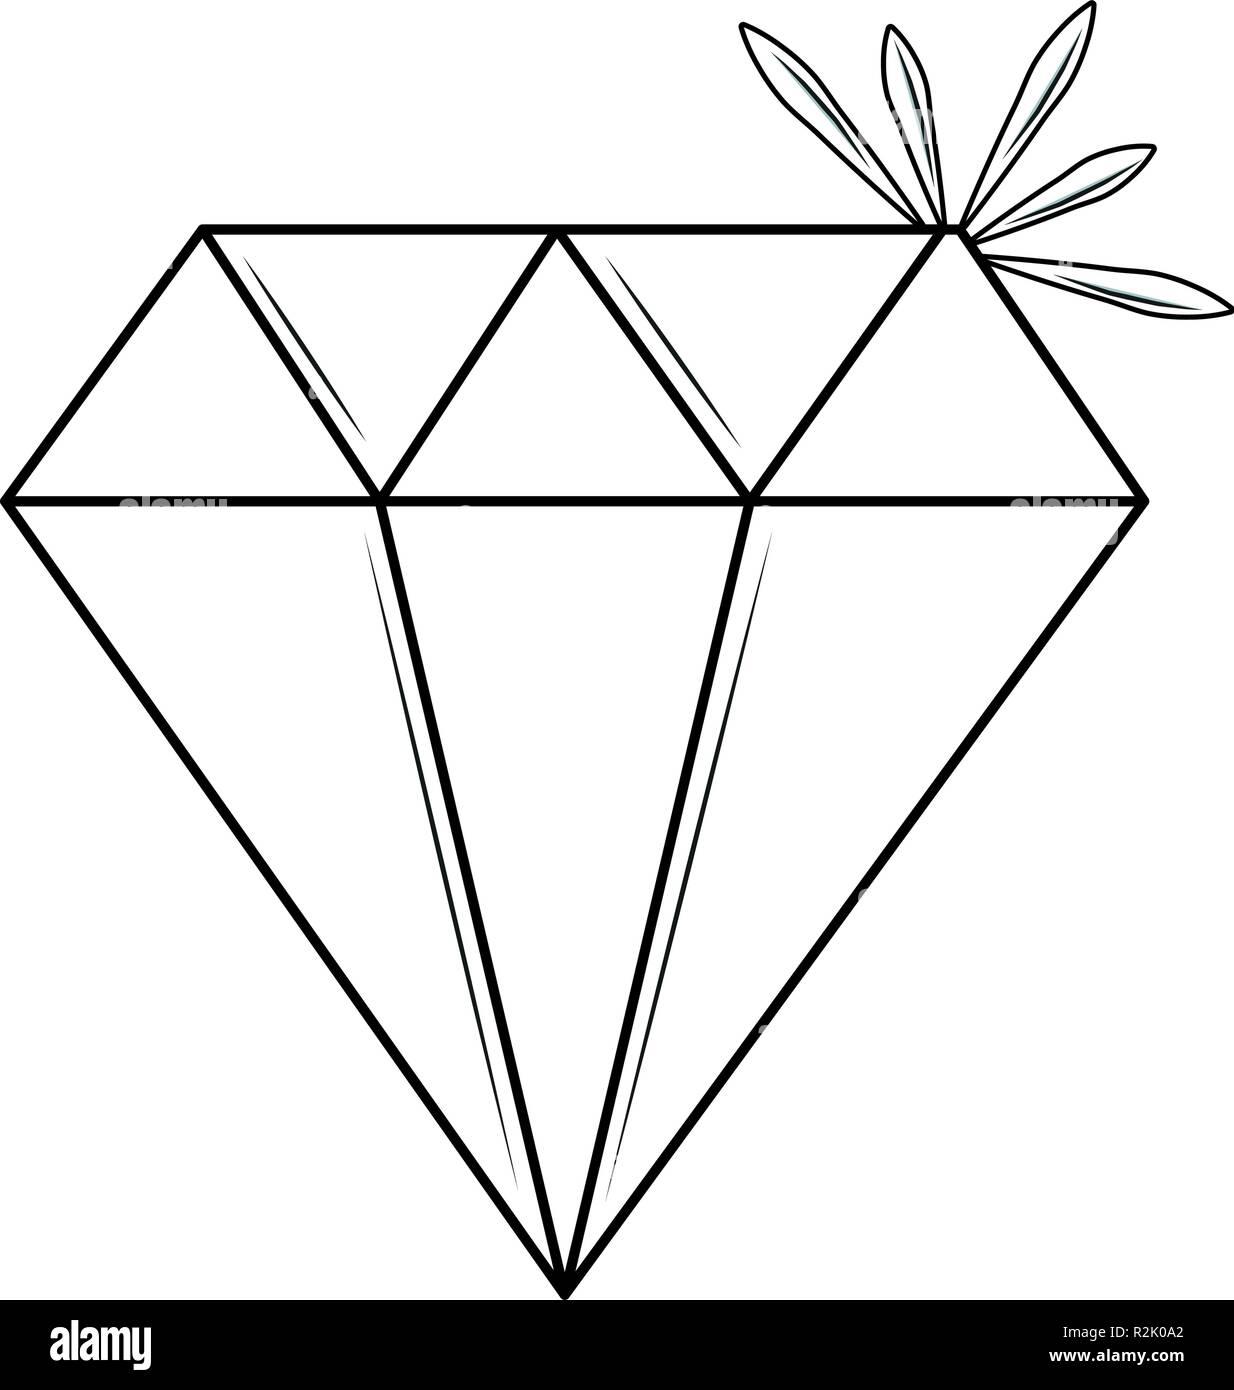 Luxury diamond stone cartoon black and white vector illustration graphic design - Stock Image